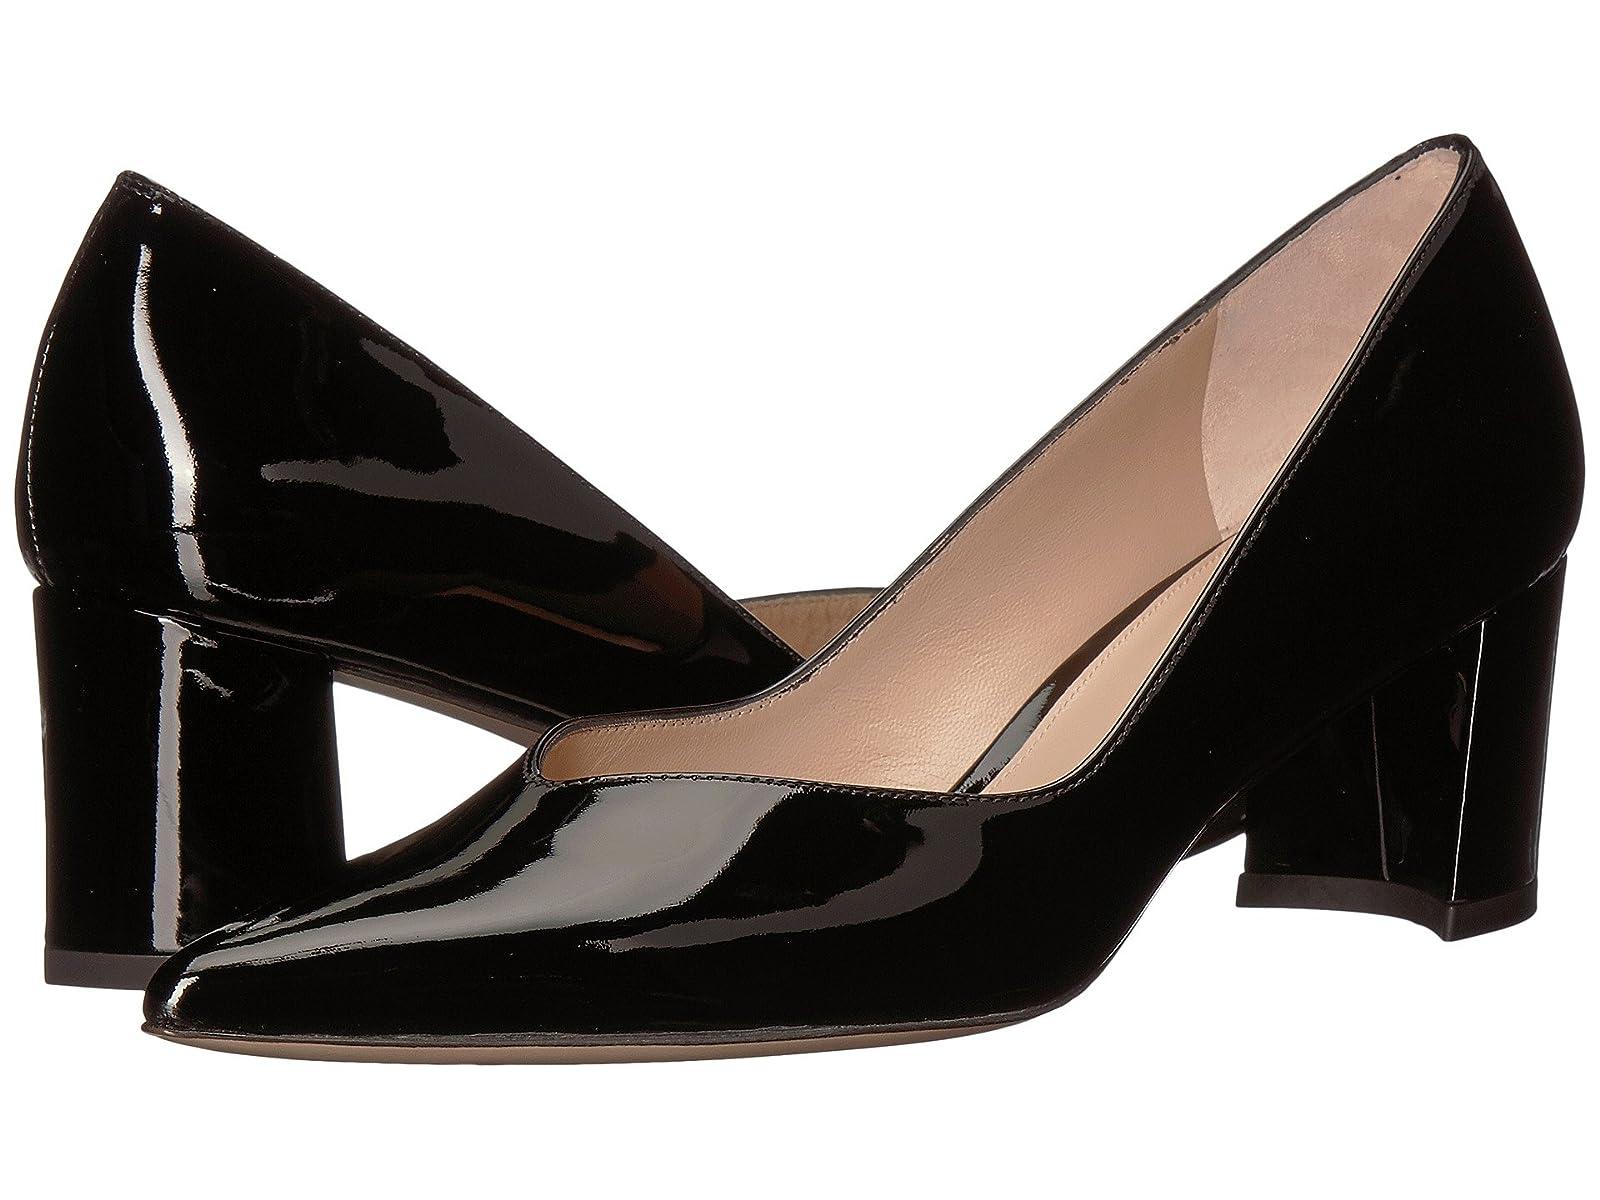 Stuart Weitzman EverystepAtmospheric grades have affordable shoes